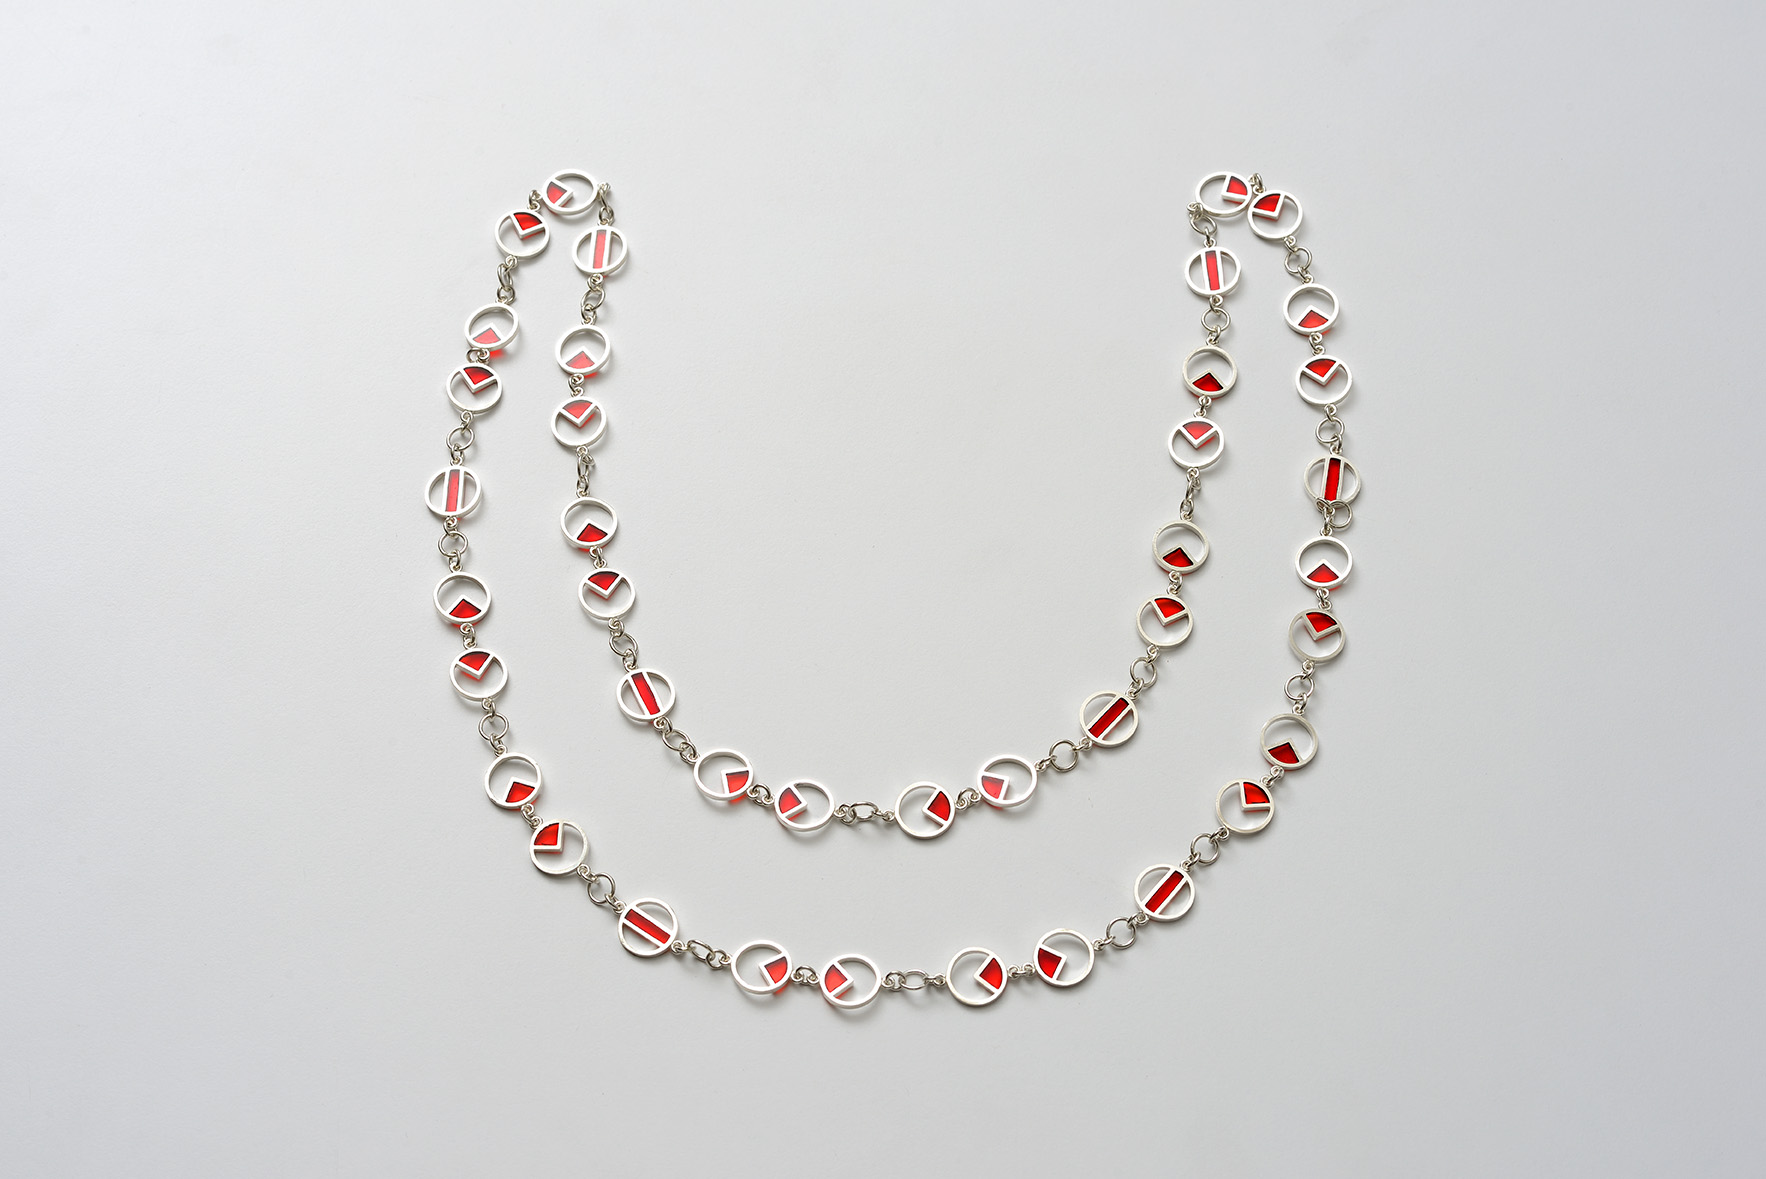 Collane artigianali - Fedra